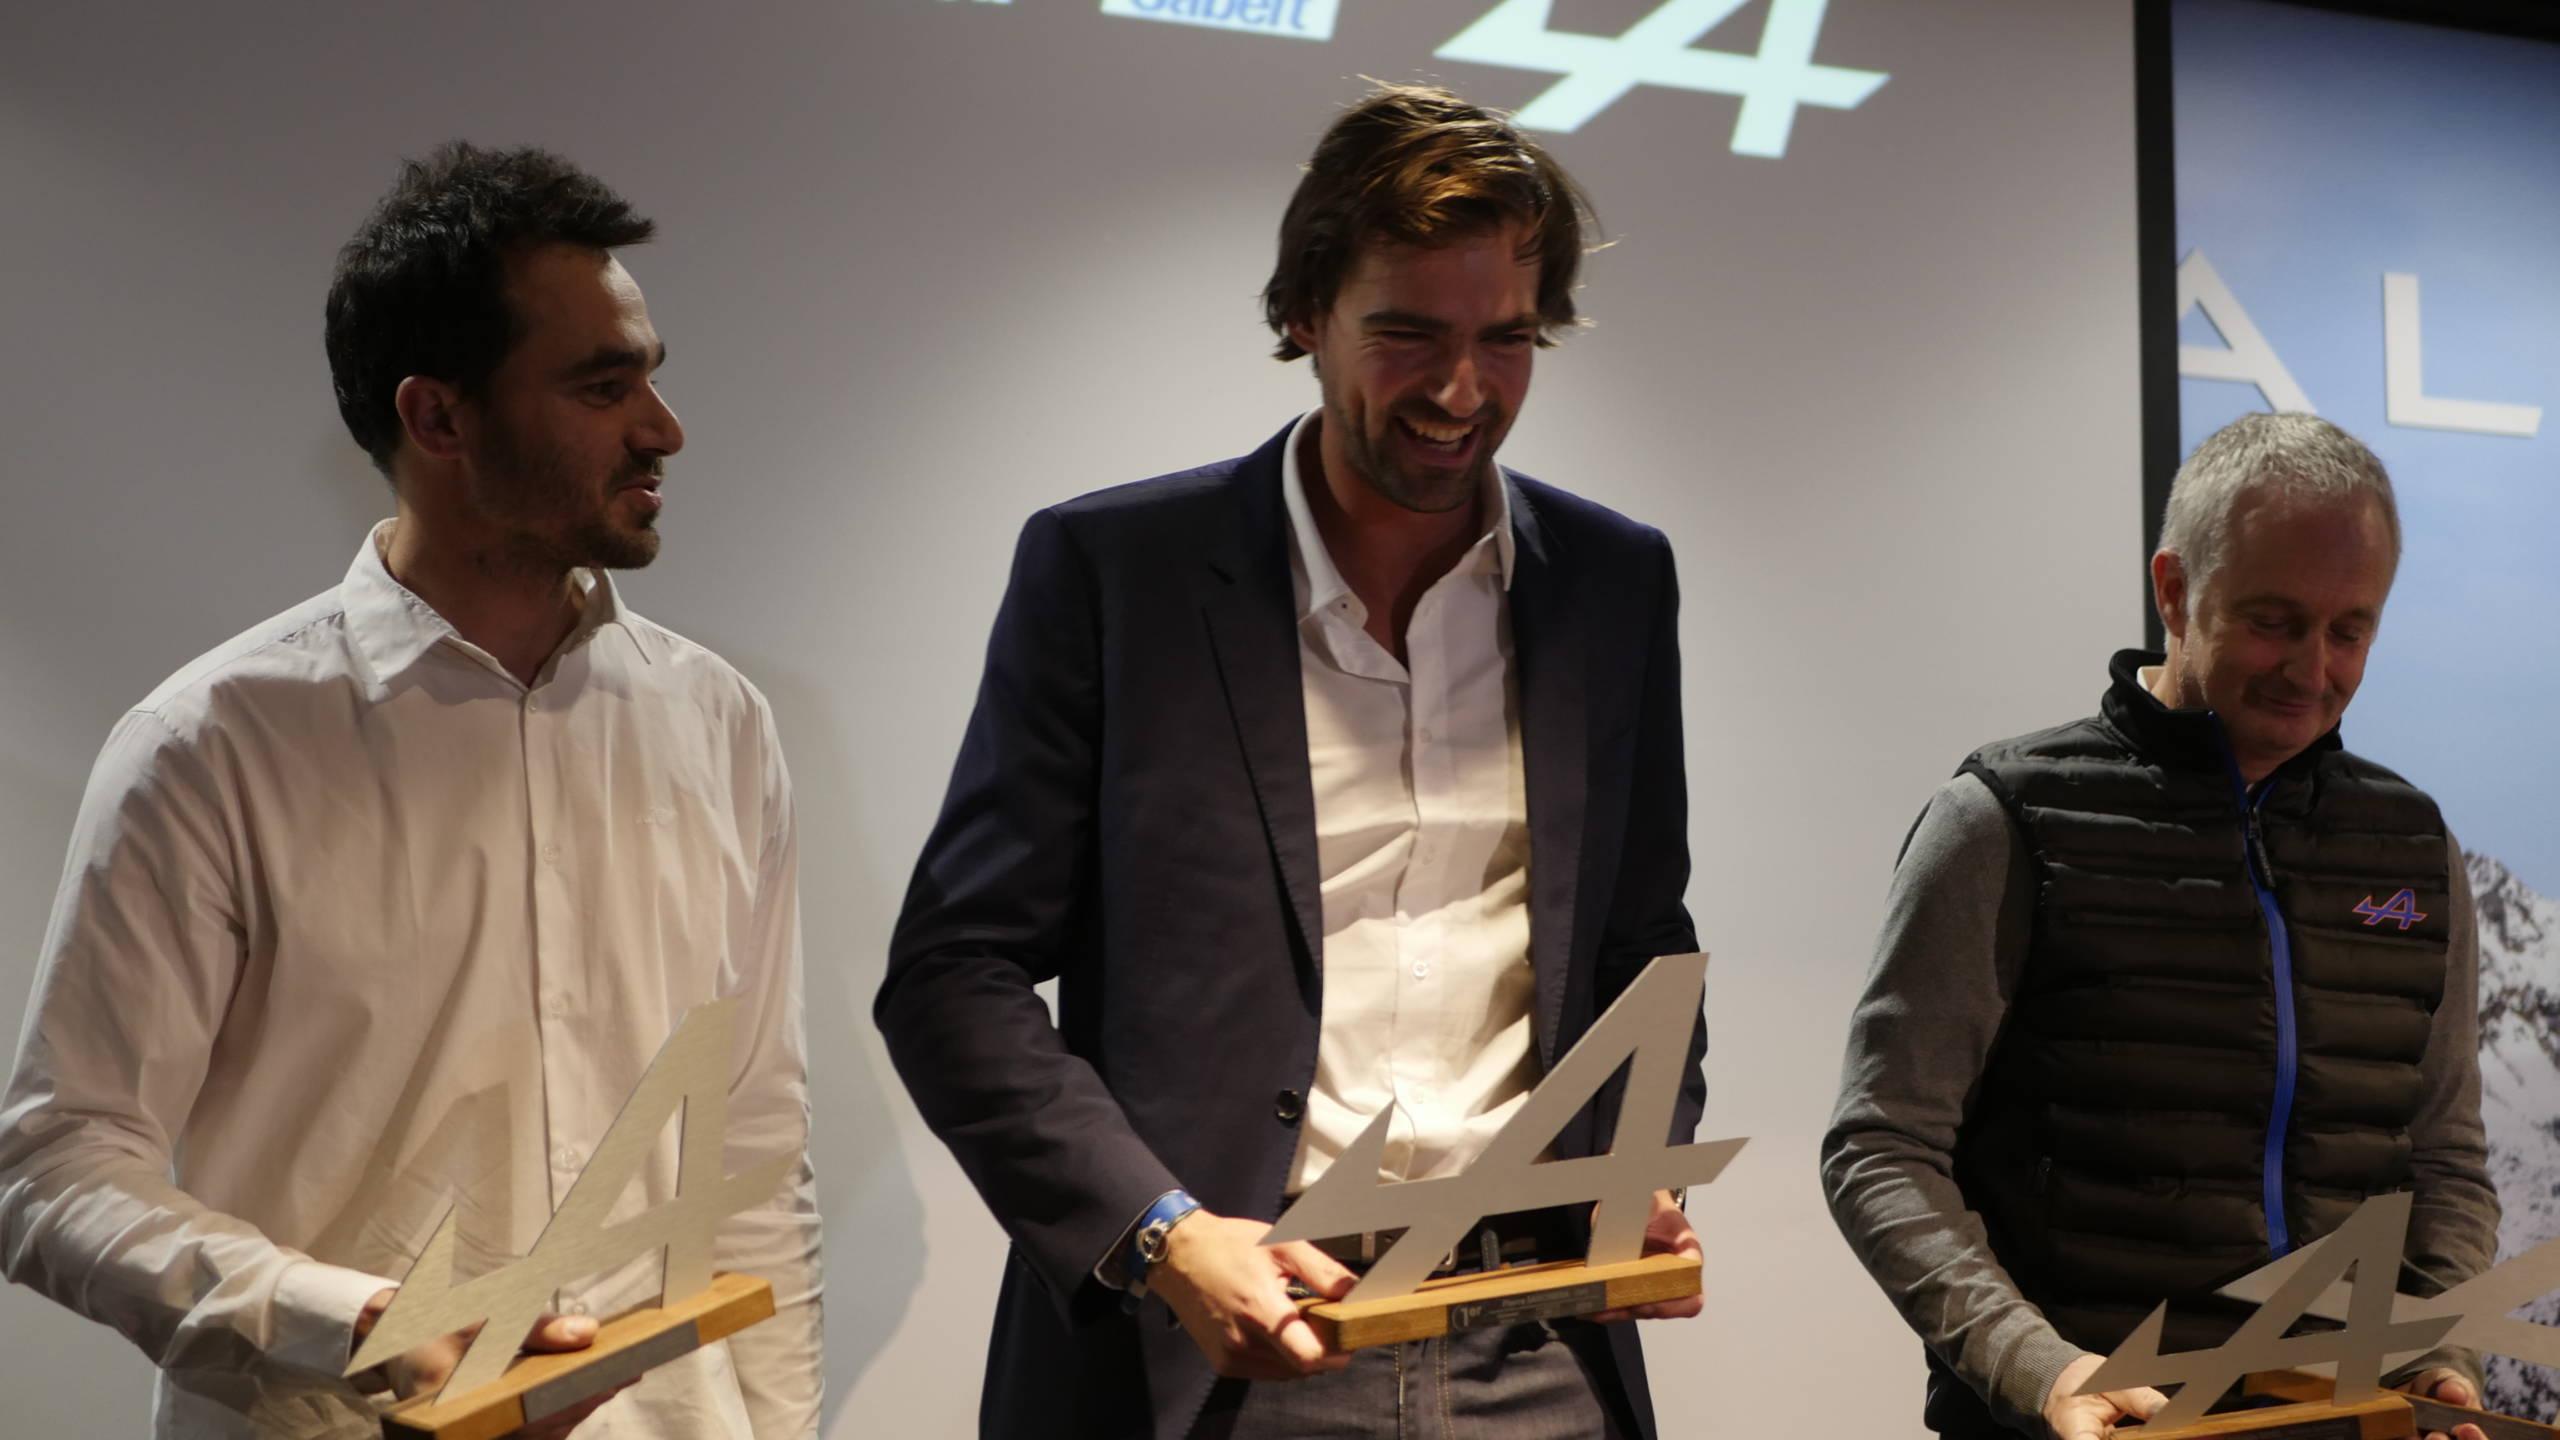 Soirée Alpine Elf Europa Cup 2018 récompense Showroom CMR 4 | Alpine Elf Europa Cup: par ici le programme 2019 !